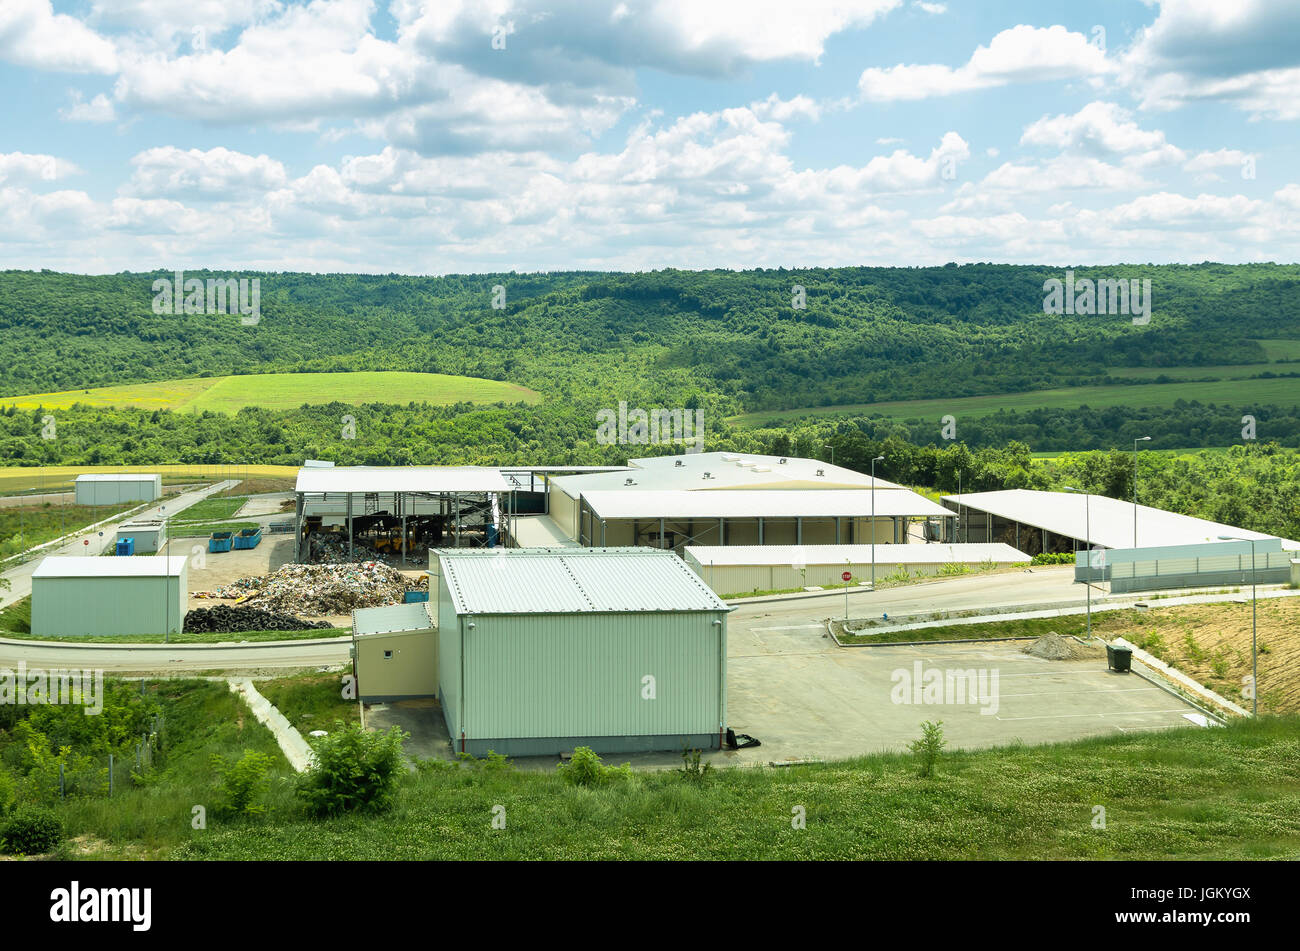 Urban landfill. Waste treatment plant depot, preparing it for separation. - Stock Image